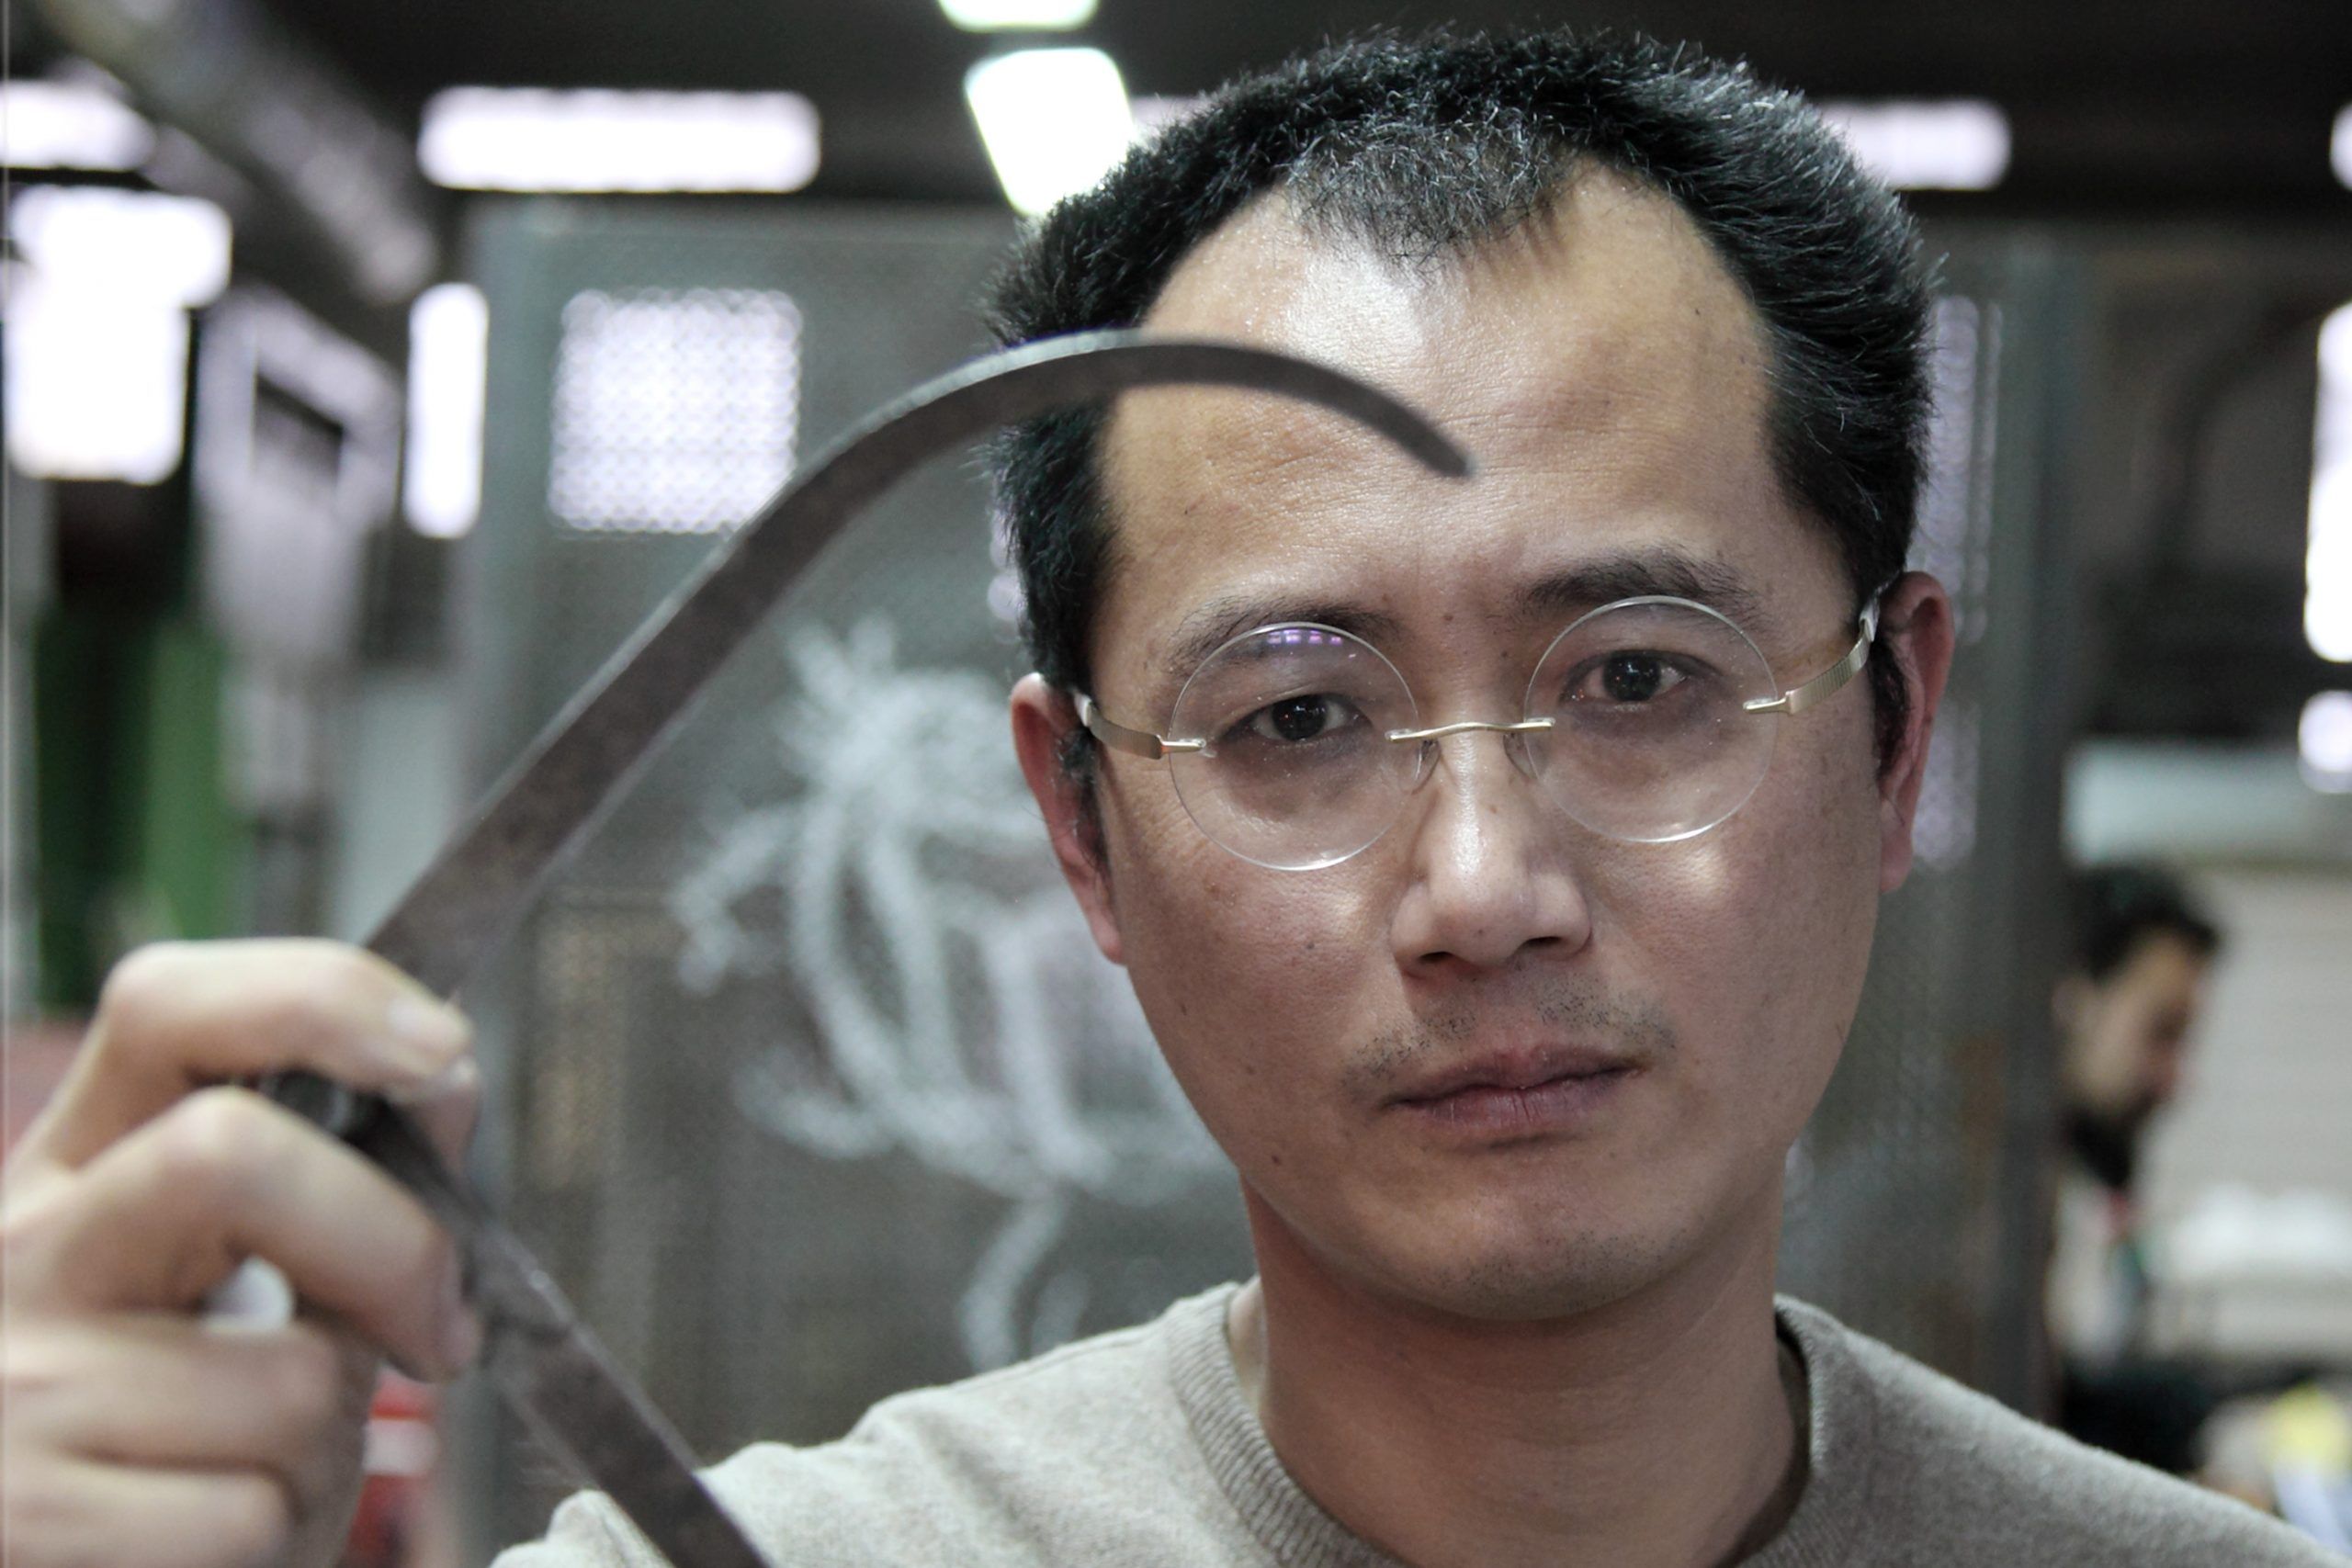 Qiu Zhijie working in Berengo Studio